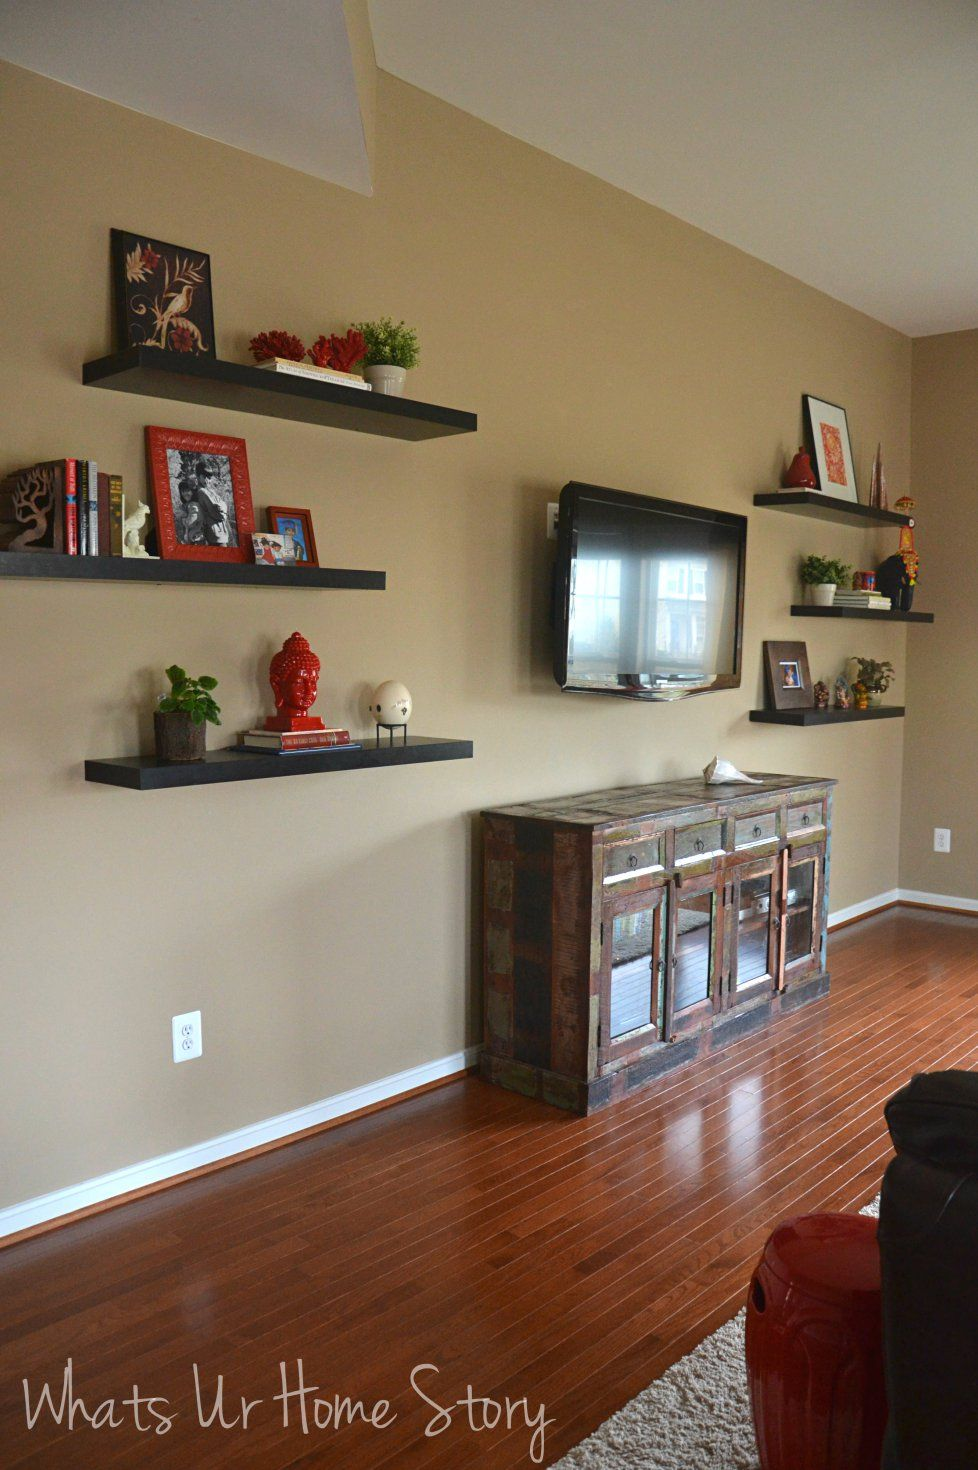 How To Hang Ikea Lack Floating Shelf Floating Shelves Living Room Decor Around Tv Shelves Around Tv